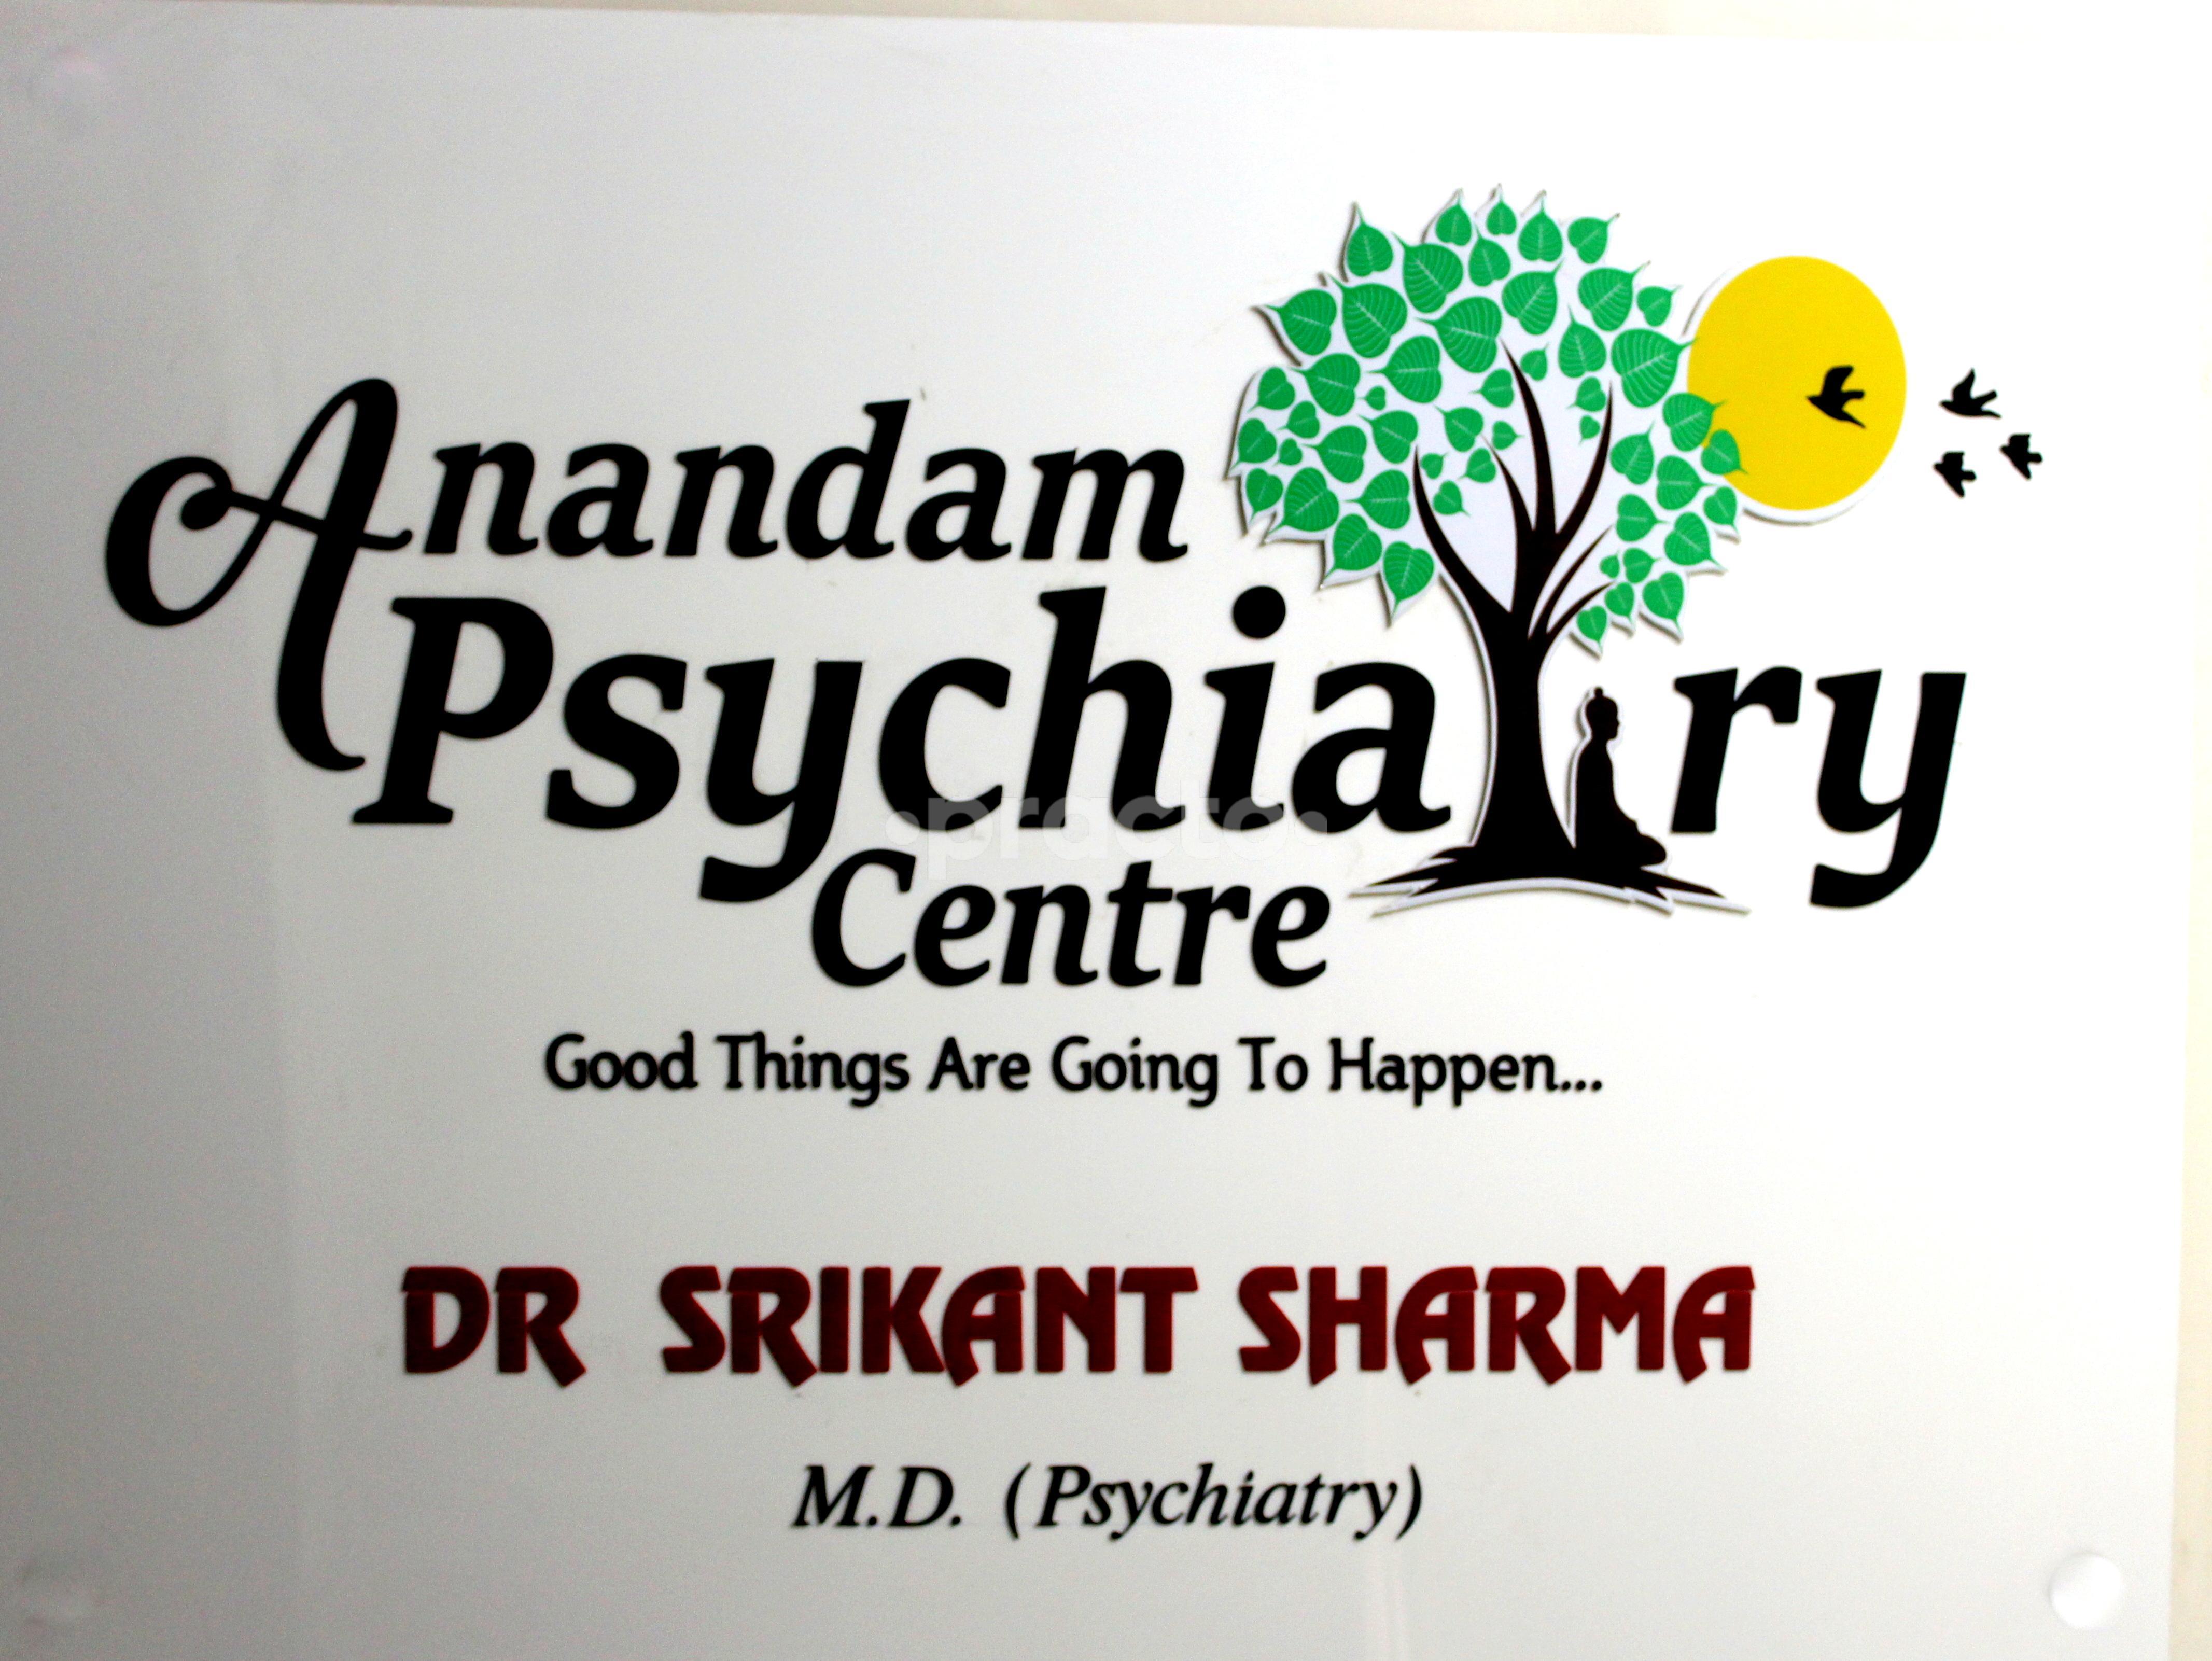 Anandam Psychiatry Centre